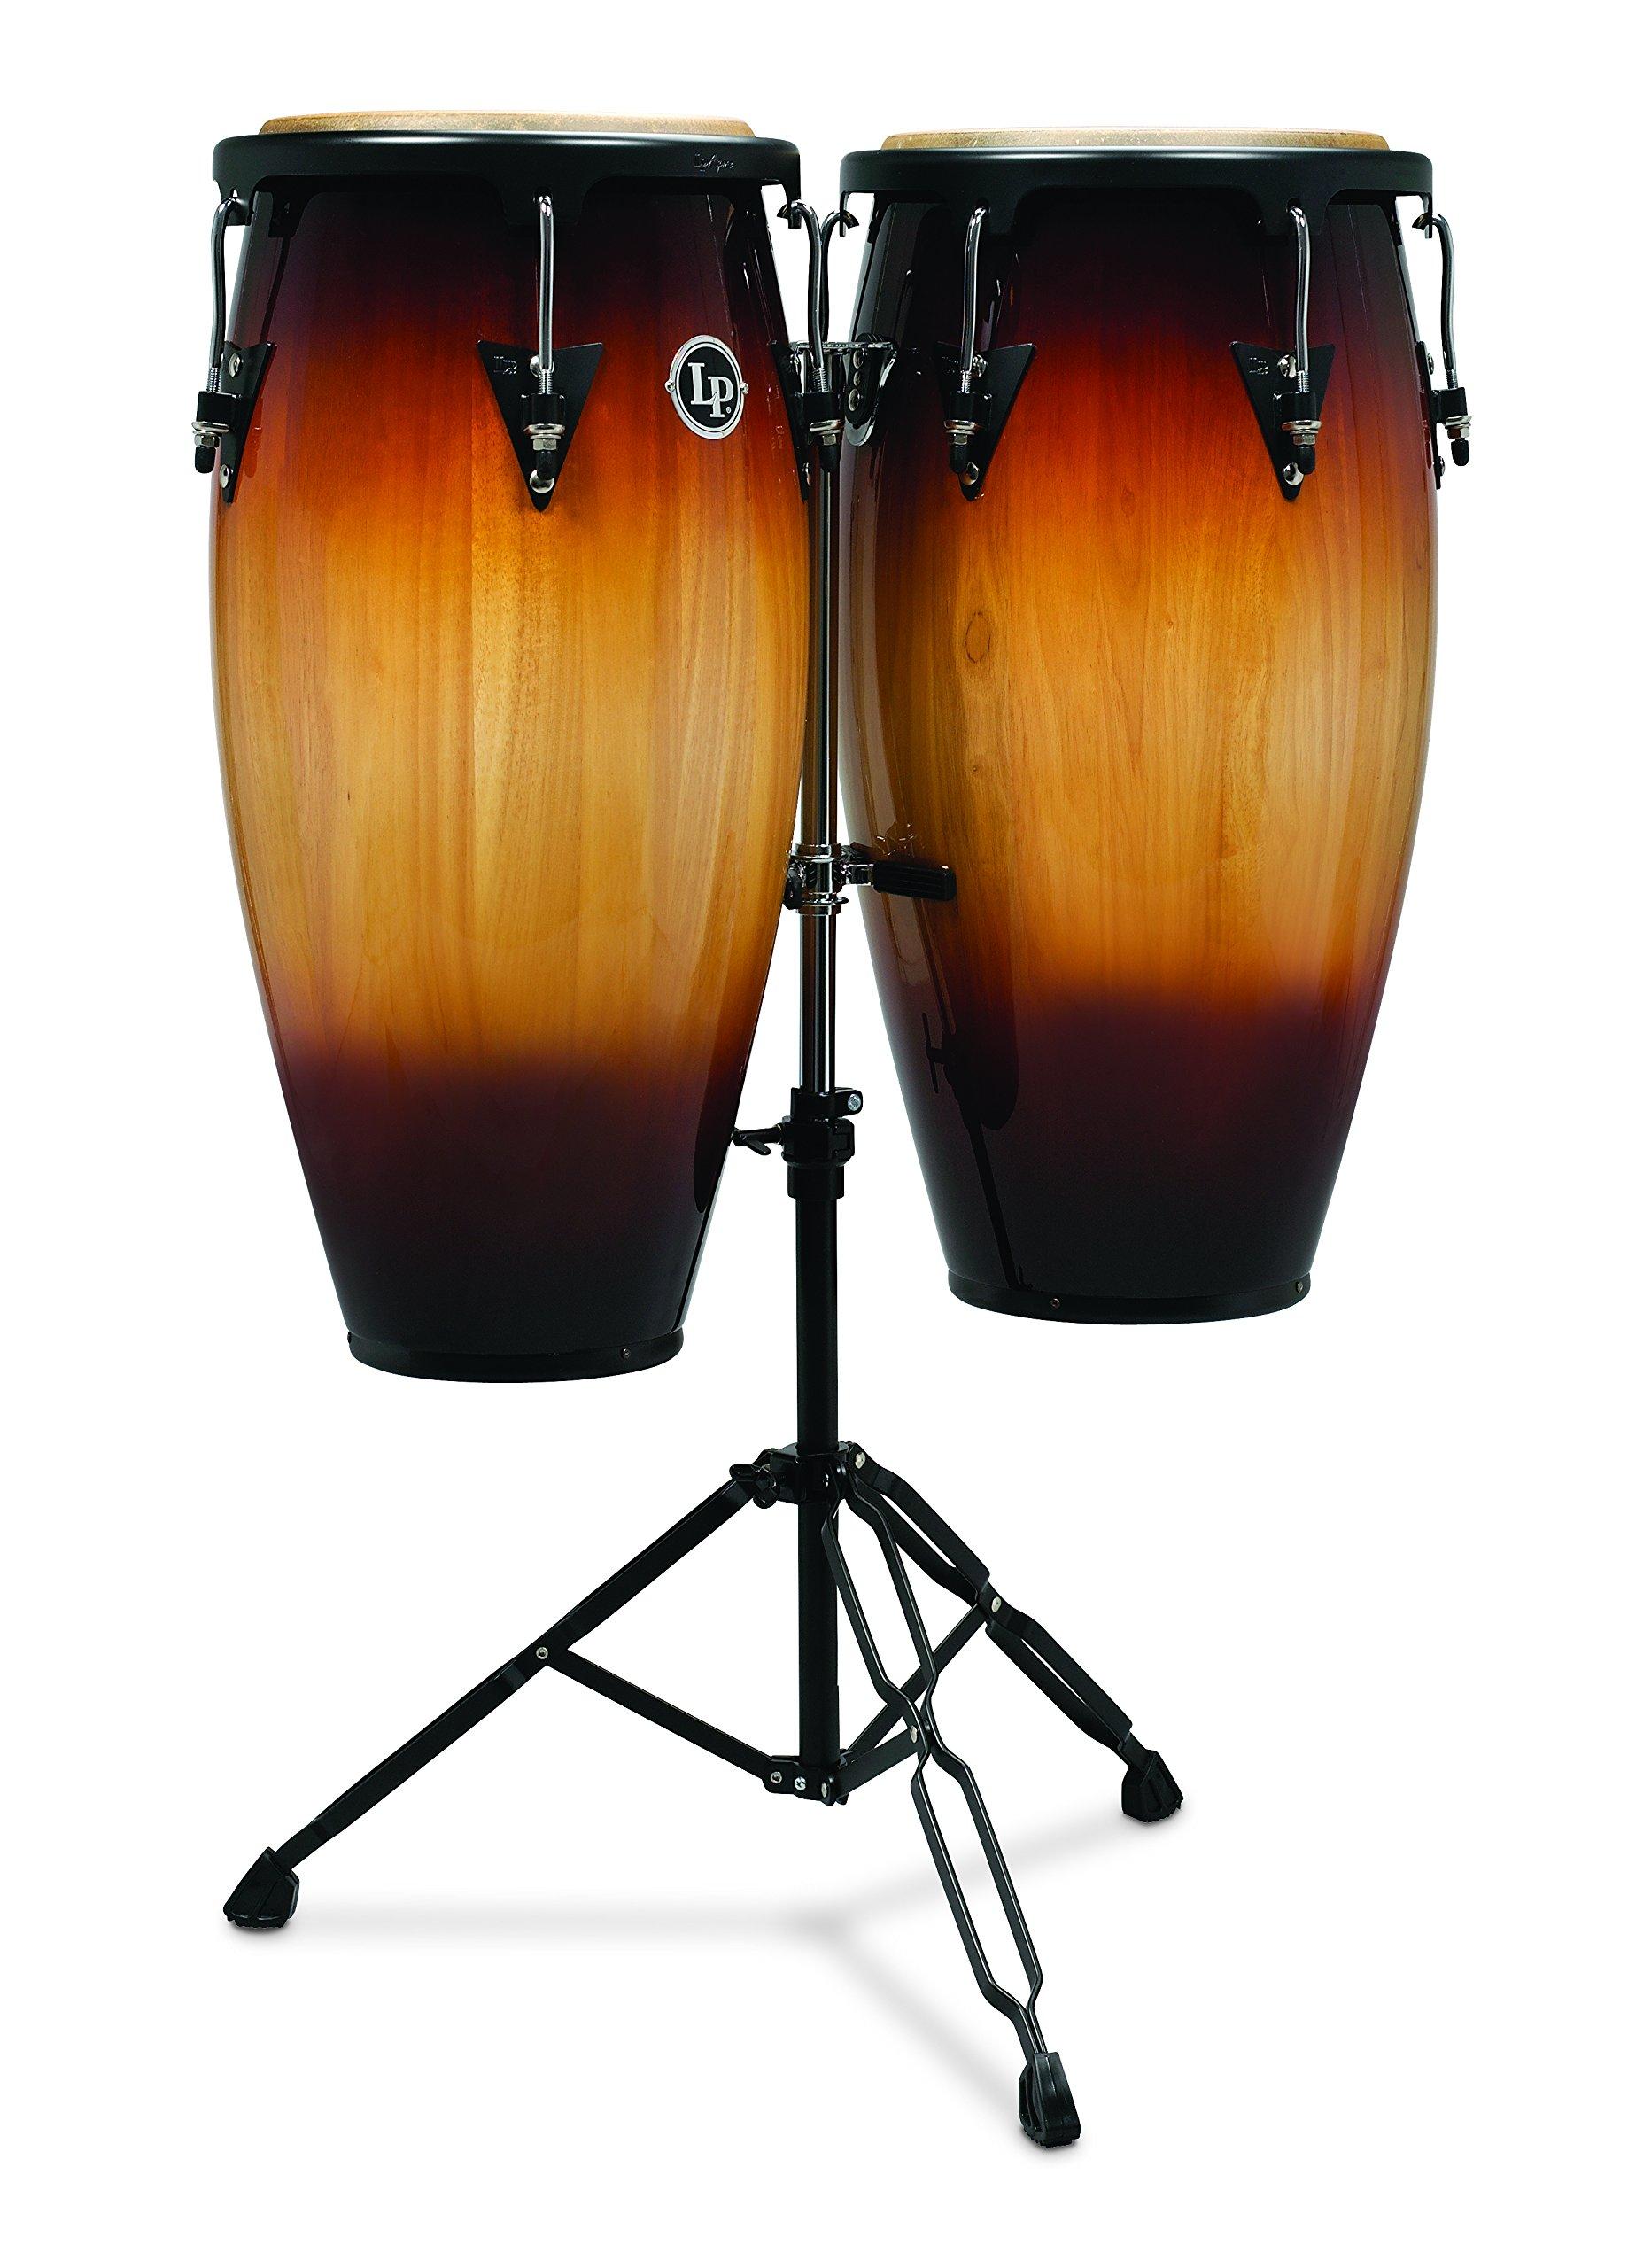 Latin Percussion LP Aspire Wood Congas 11'' & 12'' Set with Double Stand - Vintage Sunburst/Black